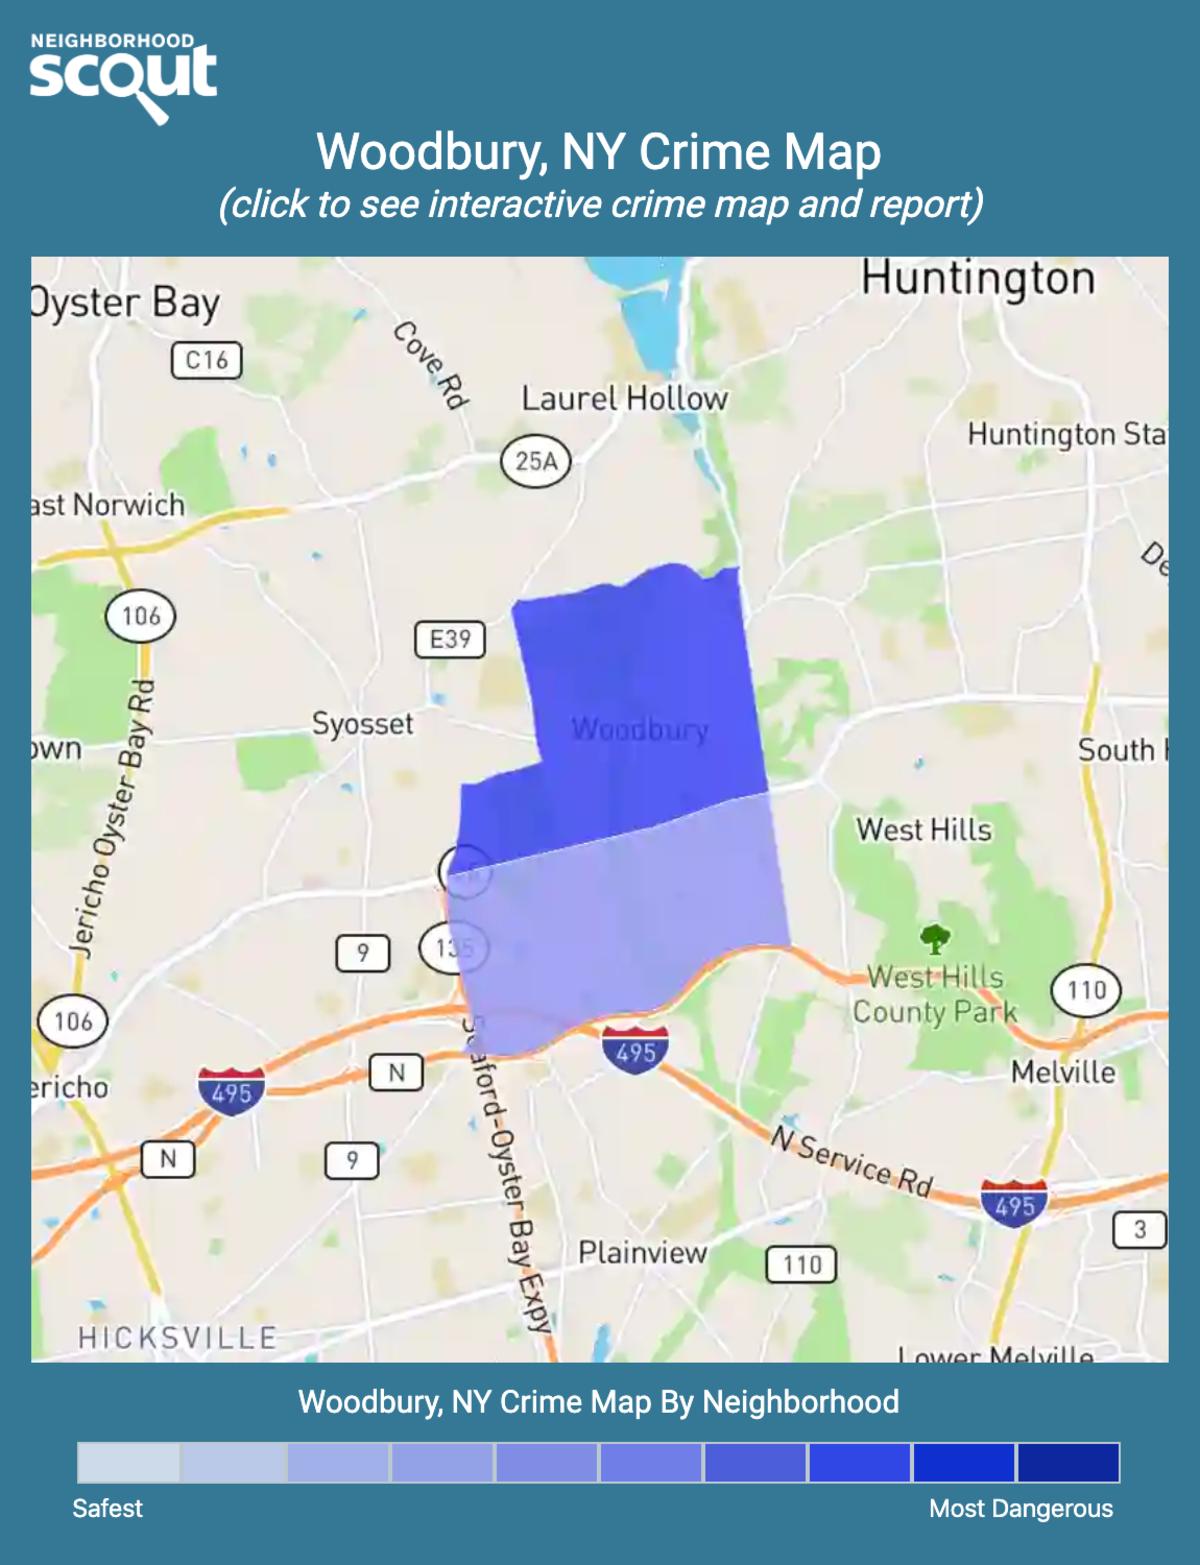 Woodbury, New York crime map